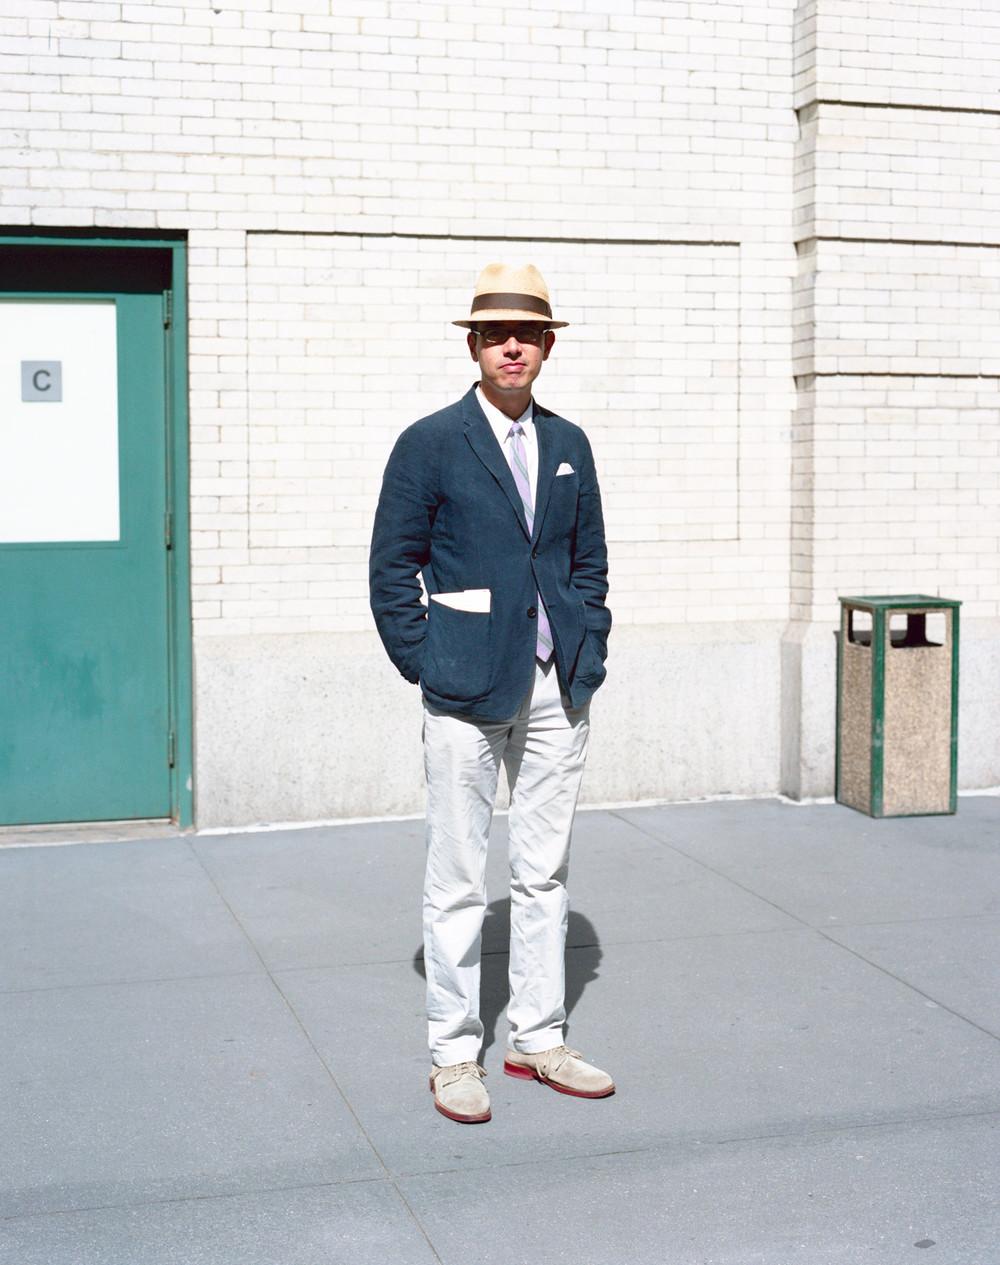 08_NYC_01_07_Max.jpg